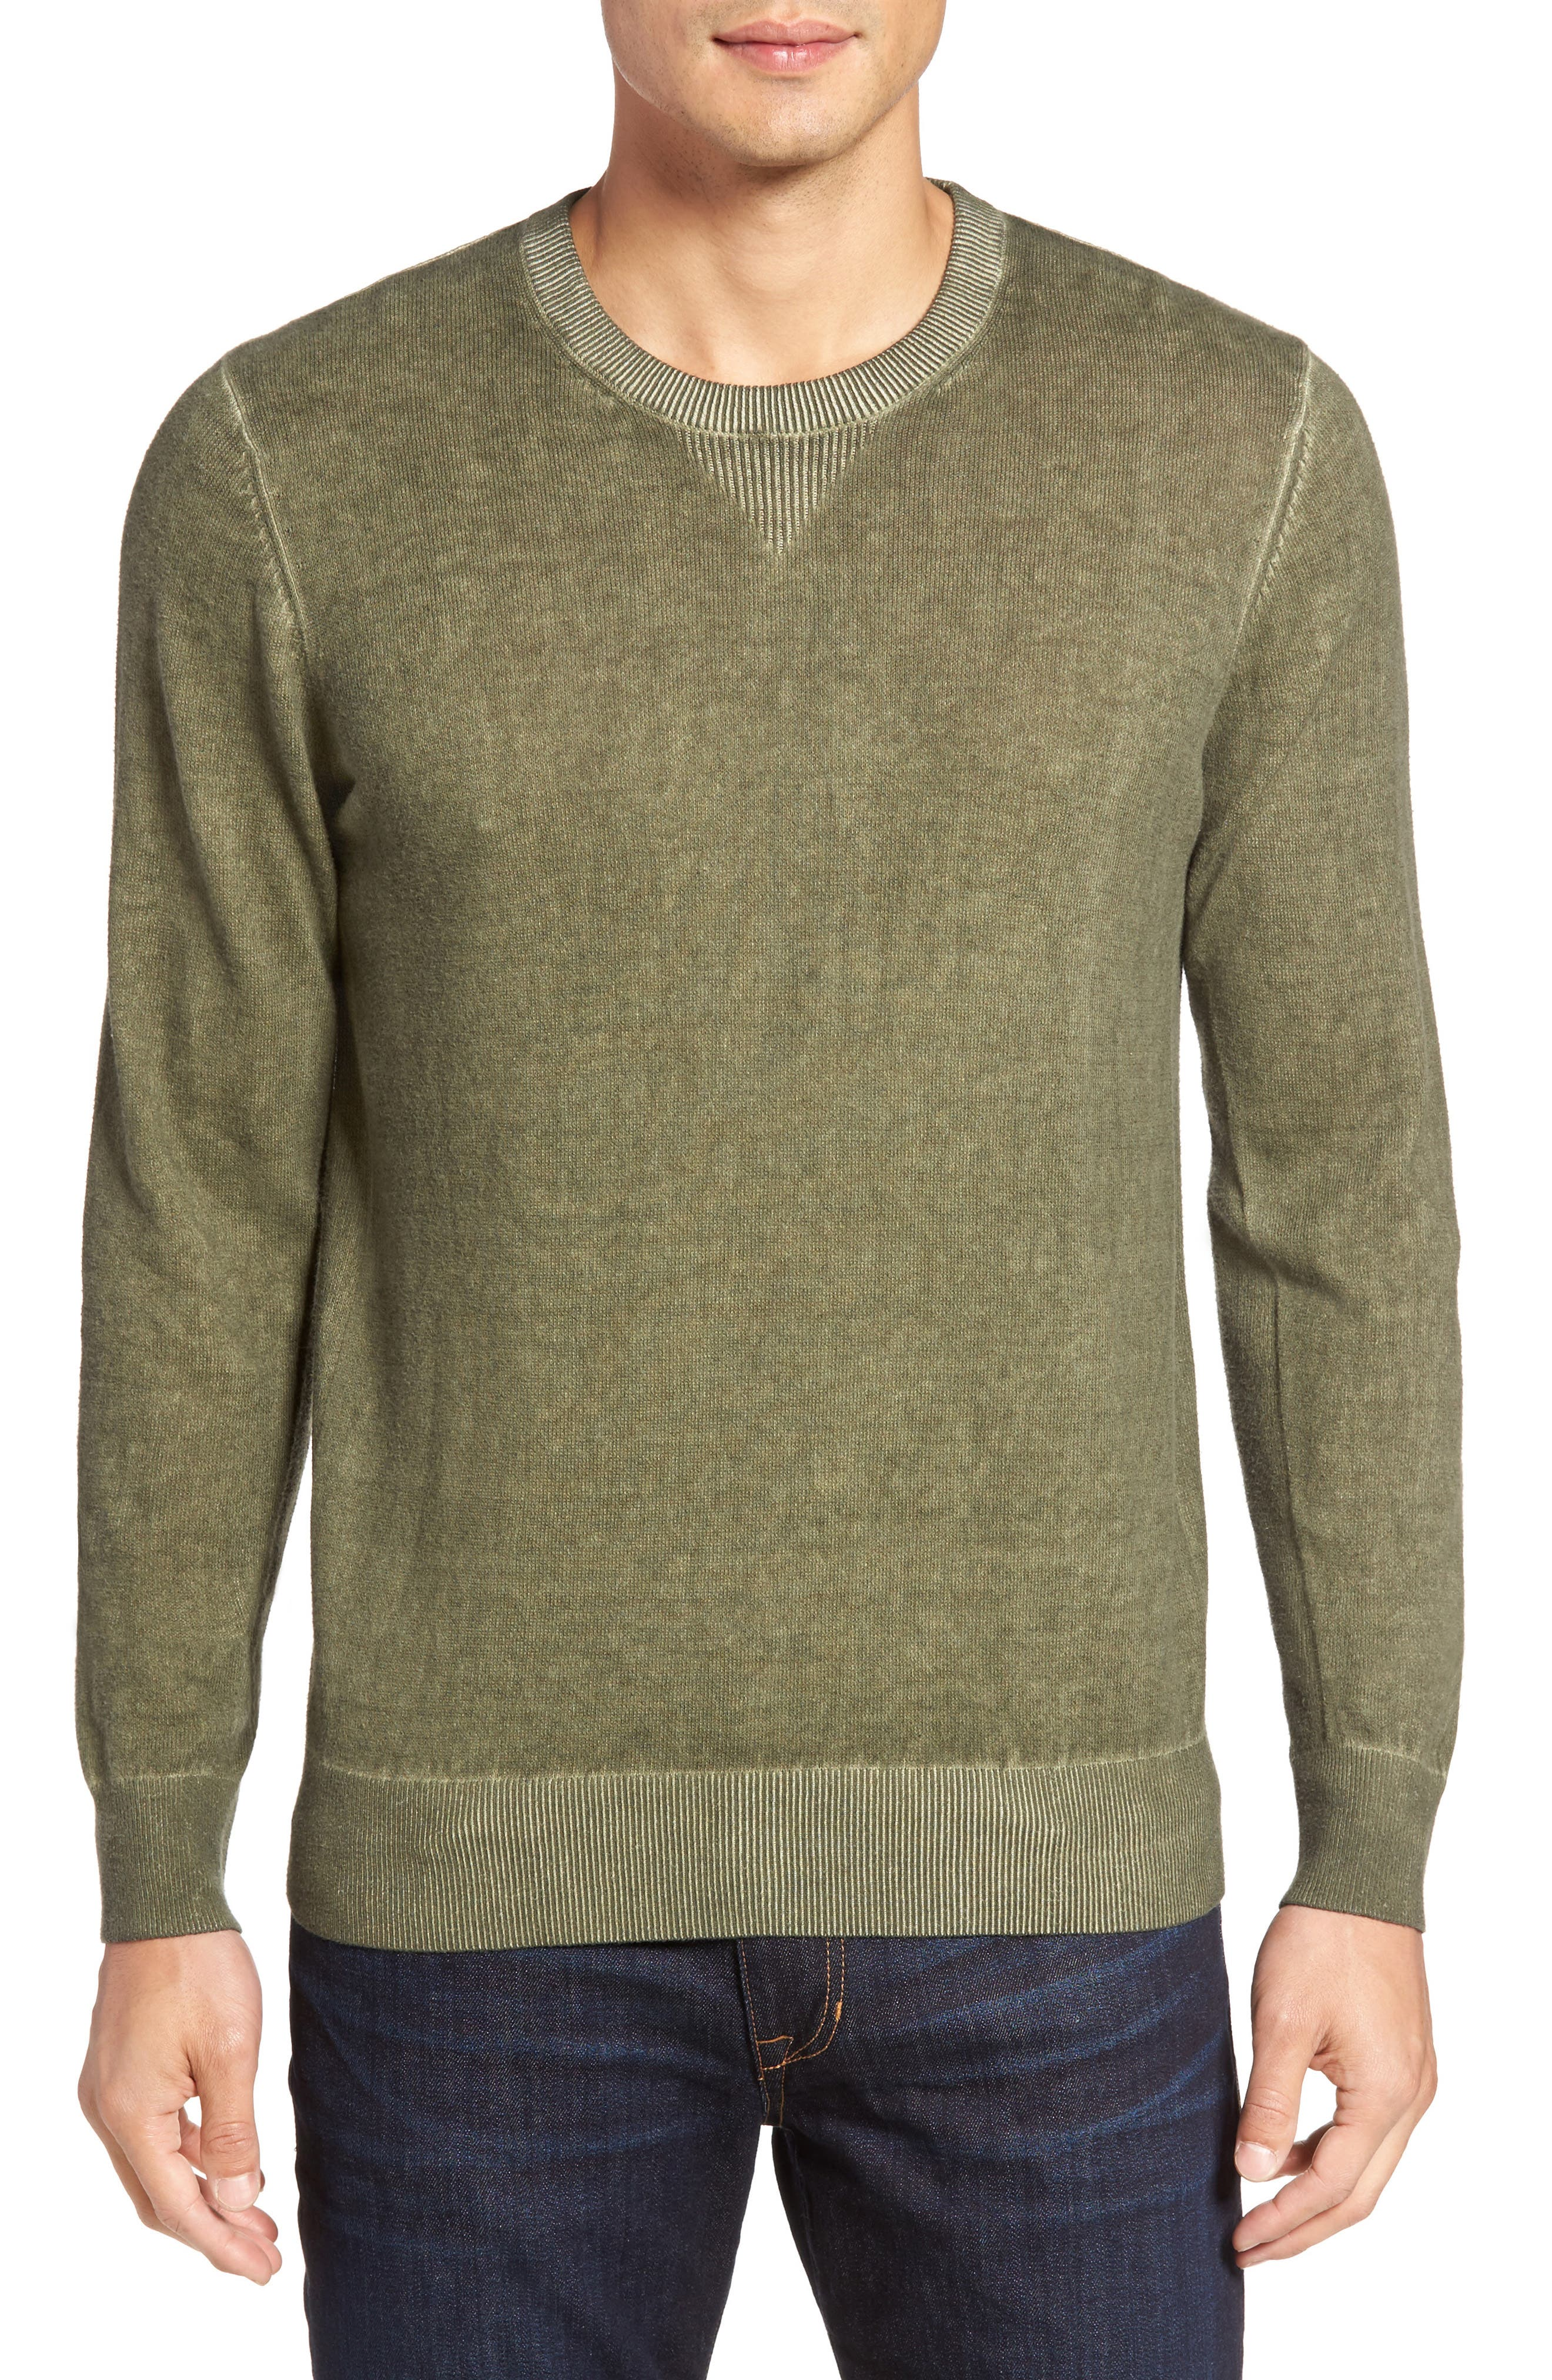 Mace Crewneck Sweater,                             Main thumbnail 1, color,                             Moonwash Caper Green